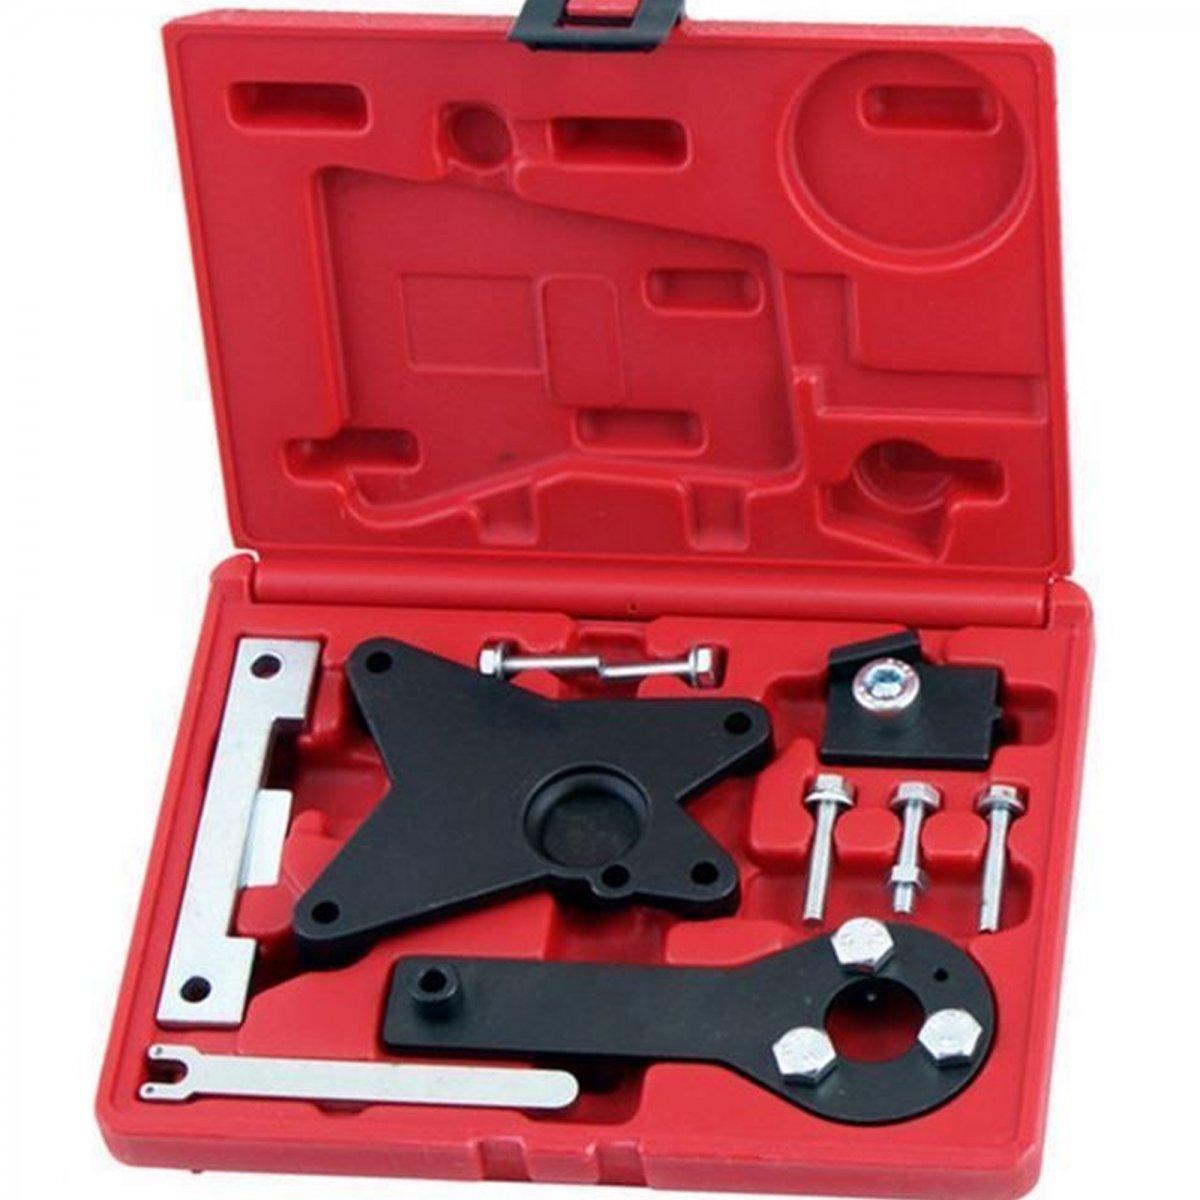 TrAdE shop Traesio Kit Toma de Fase Motor Máquina Fiat Alfa Lancia Gasolina Motores 1.2 1.4 8 V: Amazon.es: Hogar